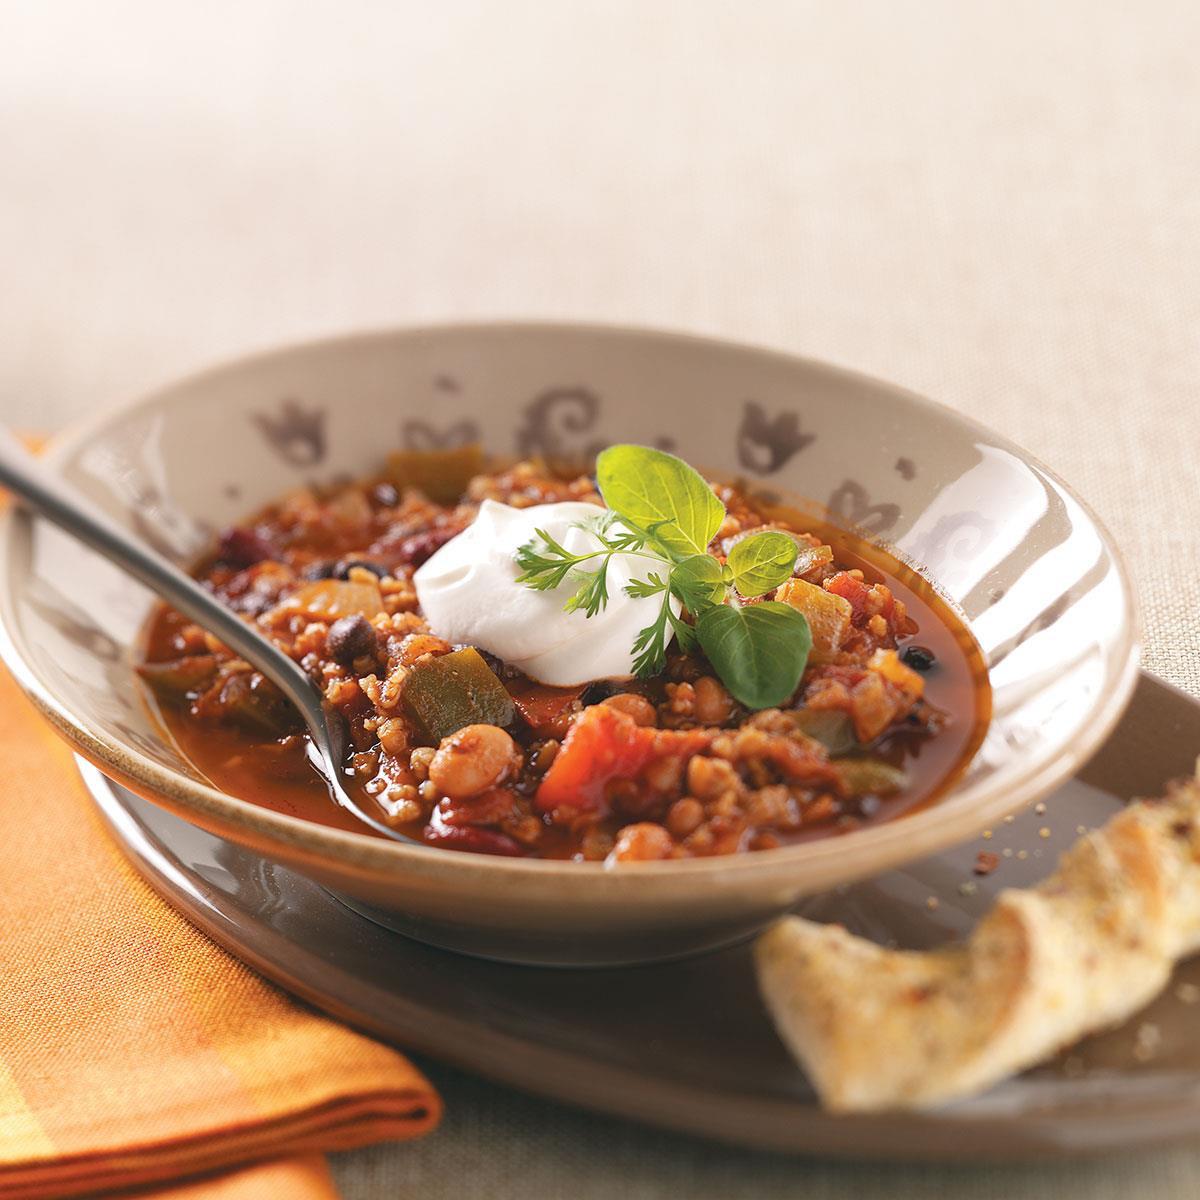 Taste Of Home Vegetarian Chili  Bean & Bulgur Chili Recipe